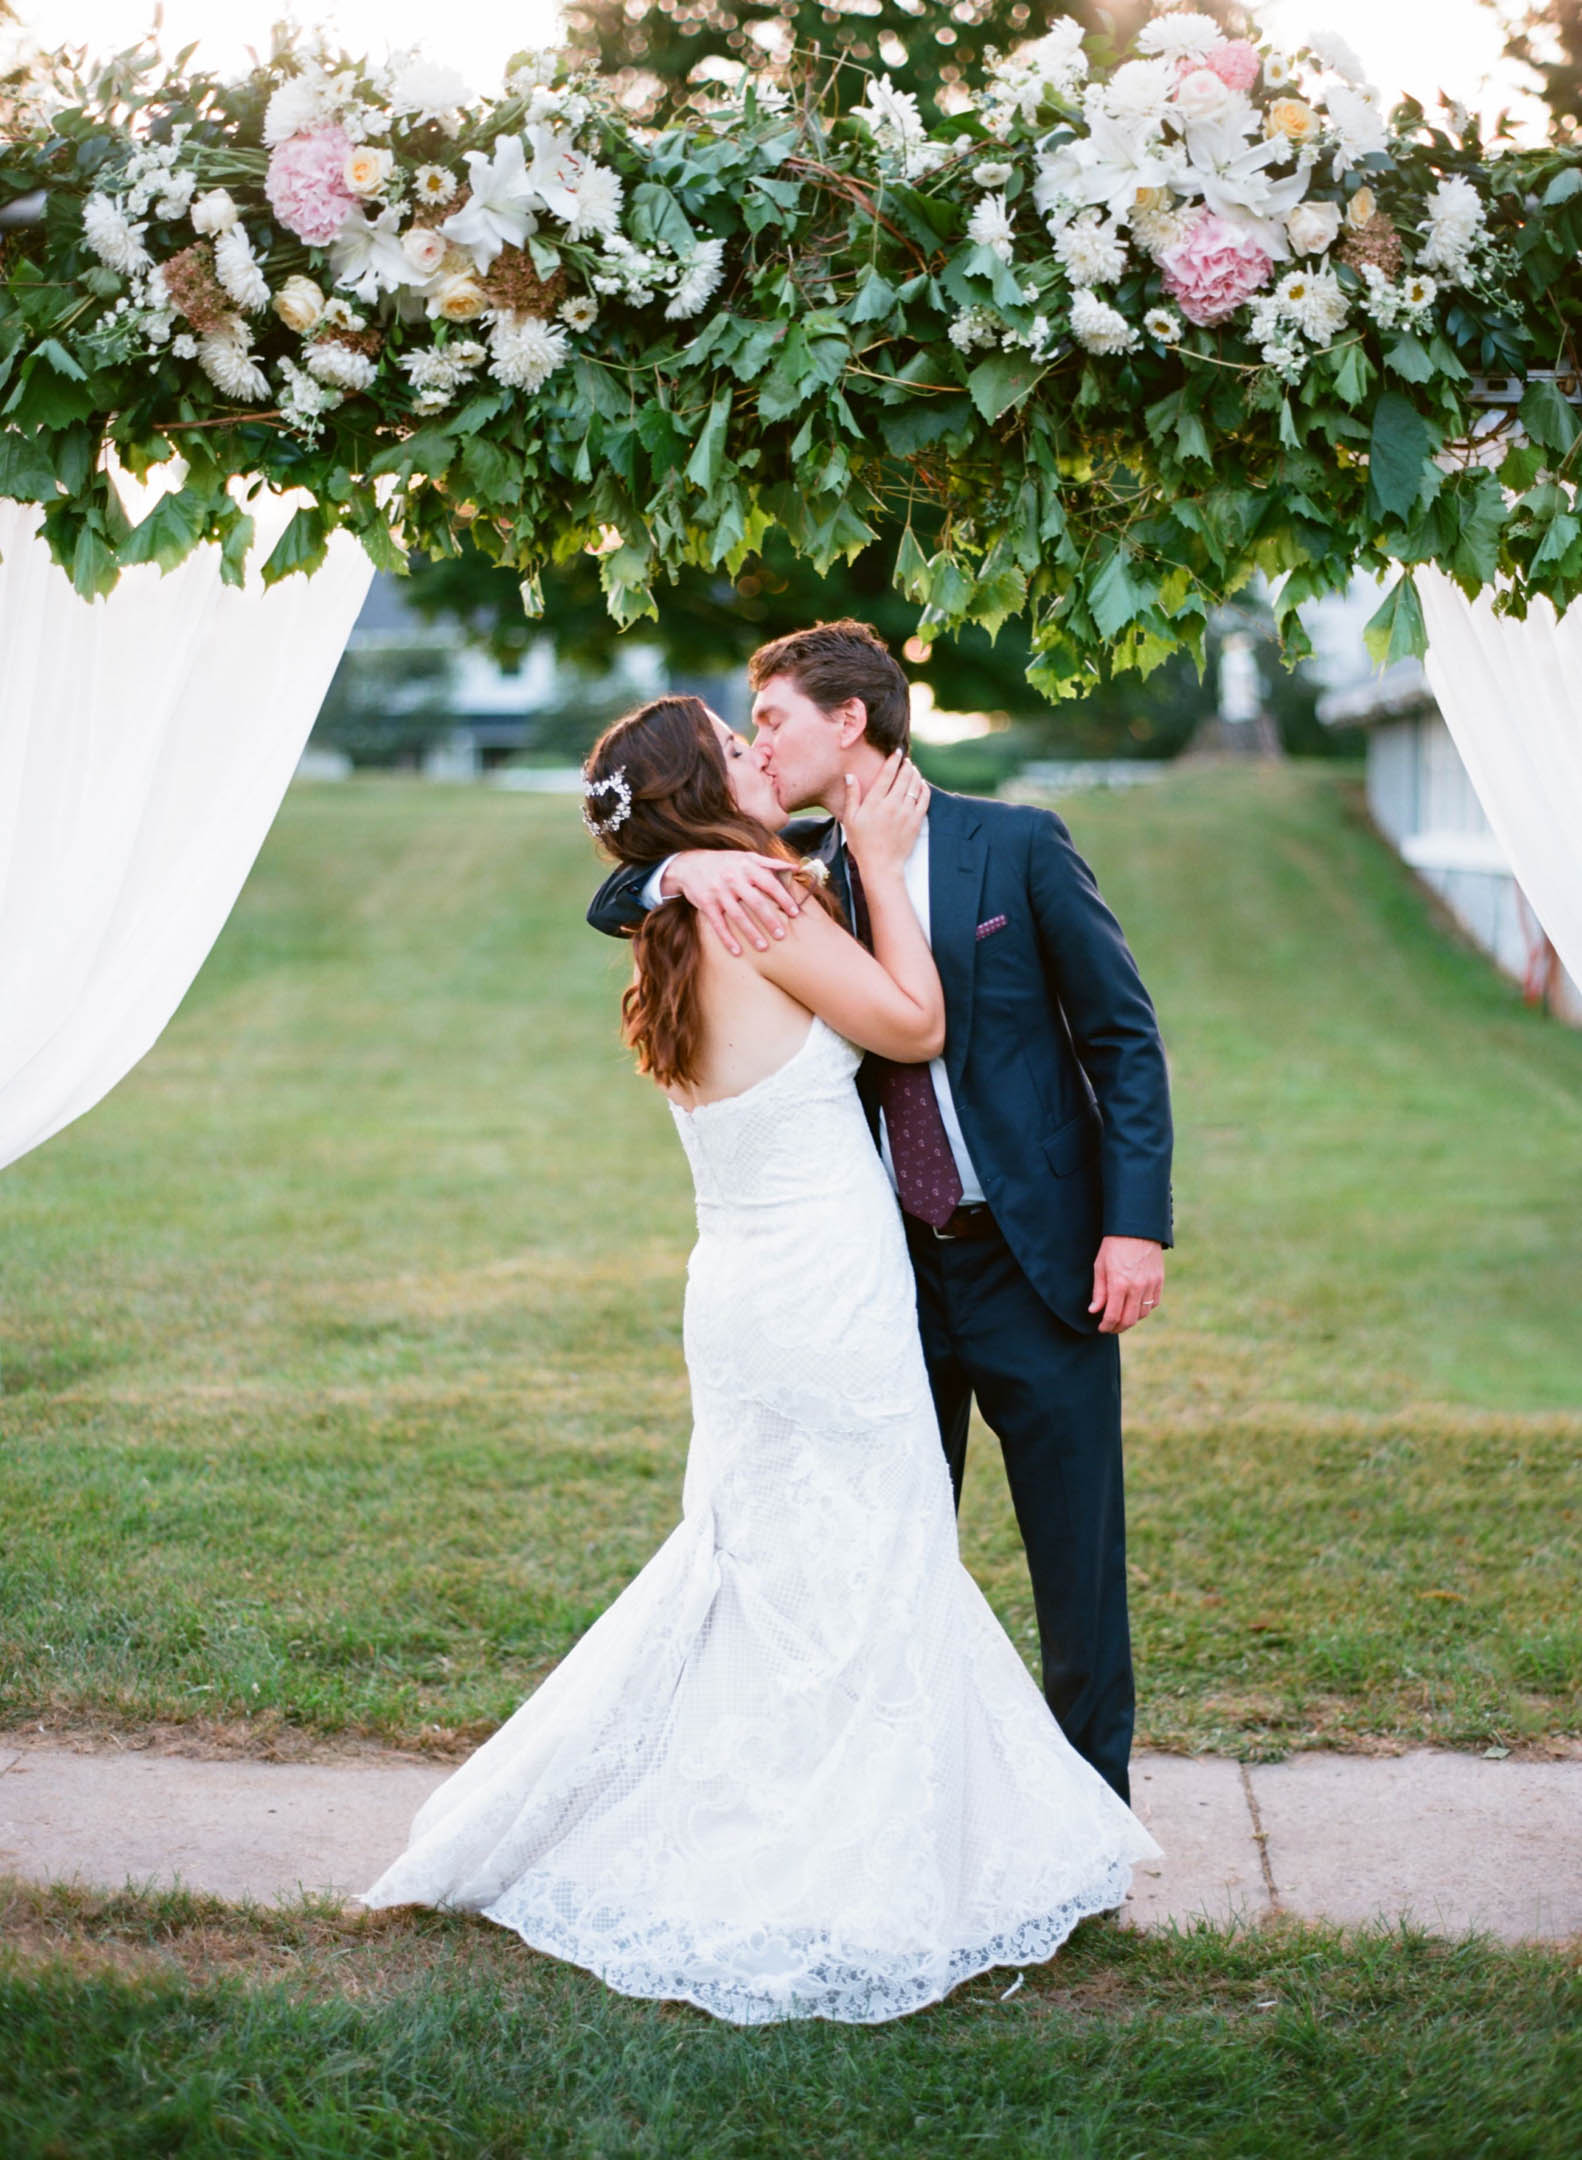 Rachel & Charlie - Horseshoe Bay Farms, Door County Wedding